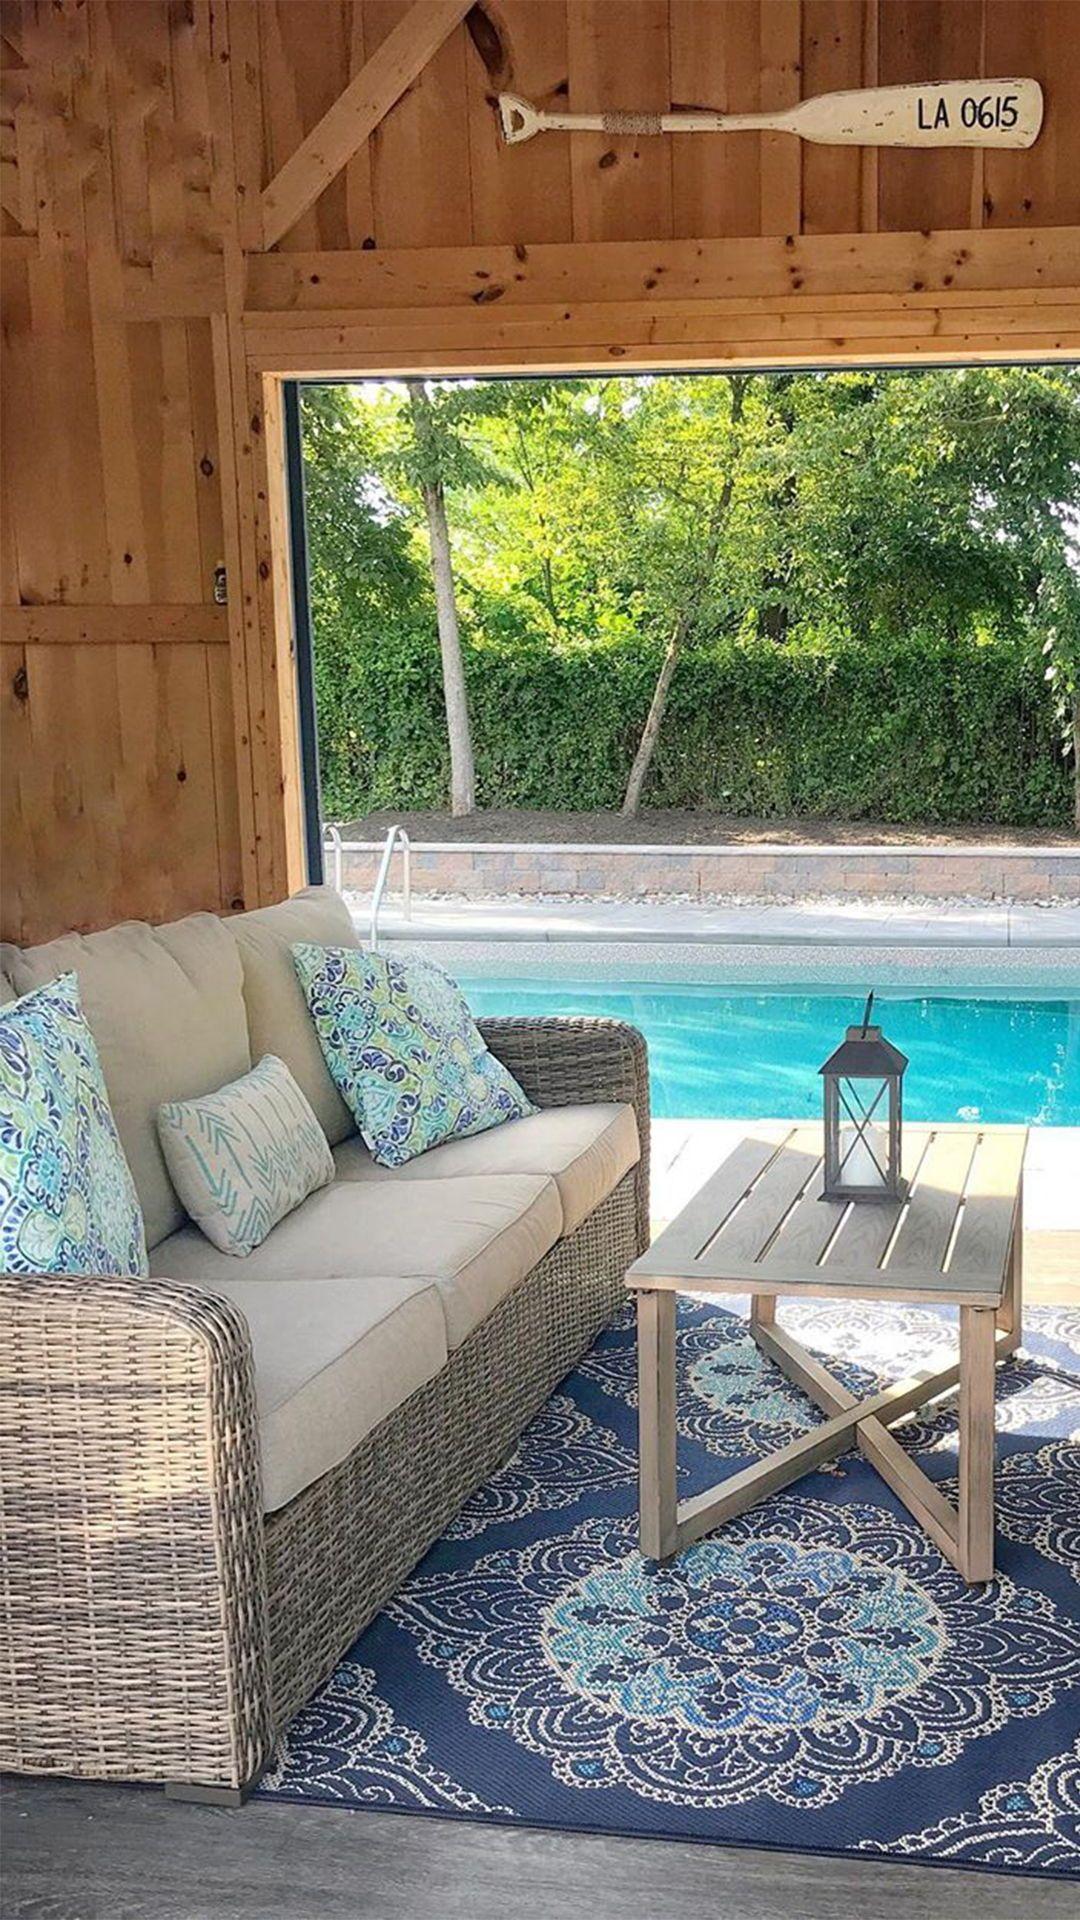 4d4423108c40a61891de60a4acf80d50 - Better Homes And Gardens Hawthorne Park Outdoor Chaise Lounge